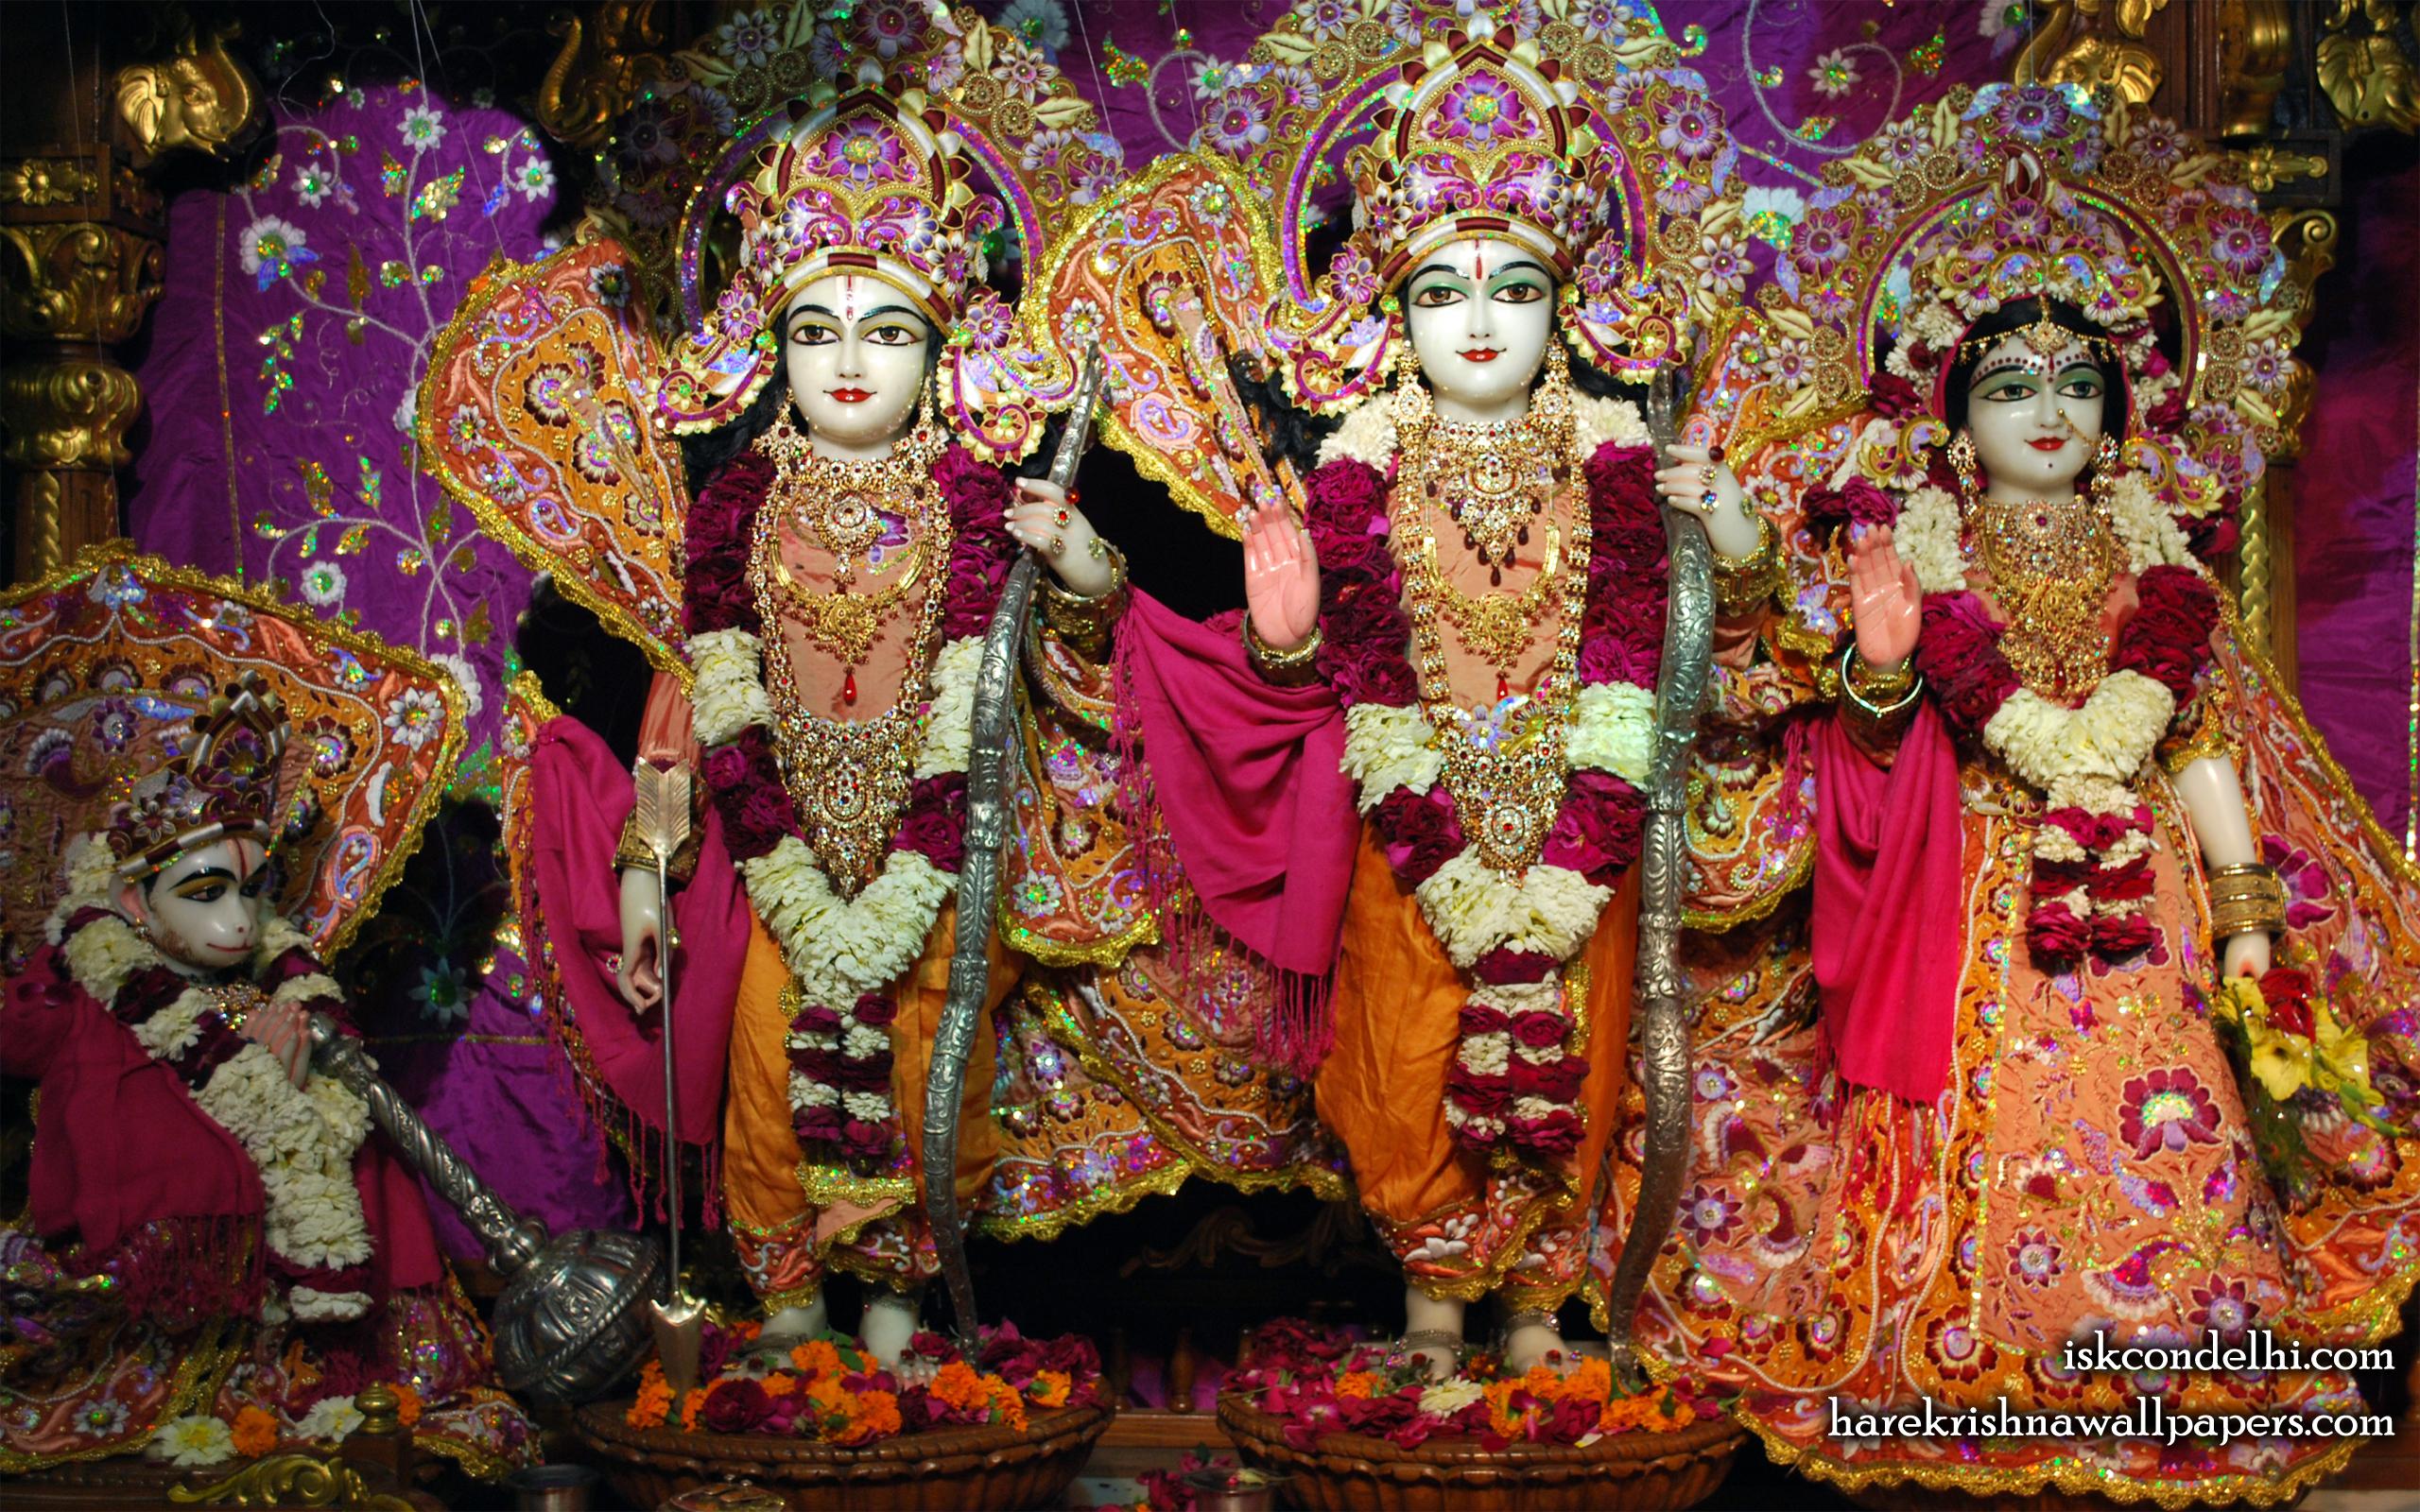 Sri Sri Sita Rama Laxman Hanuman Wallpaper (008) Size 2560x1600 Download